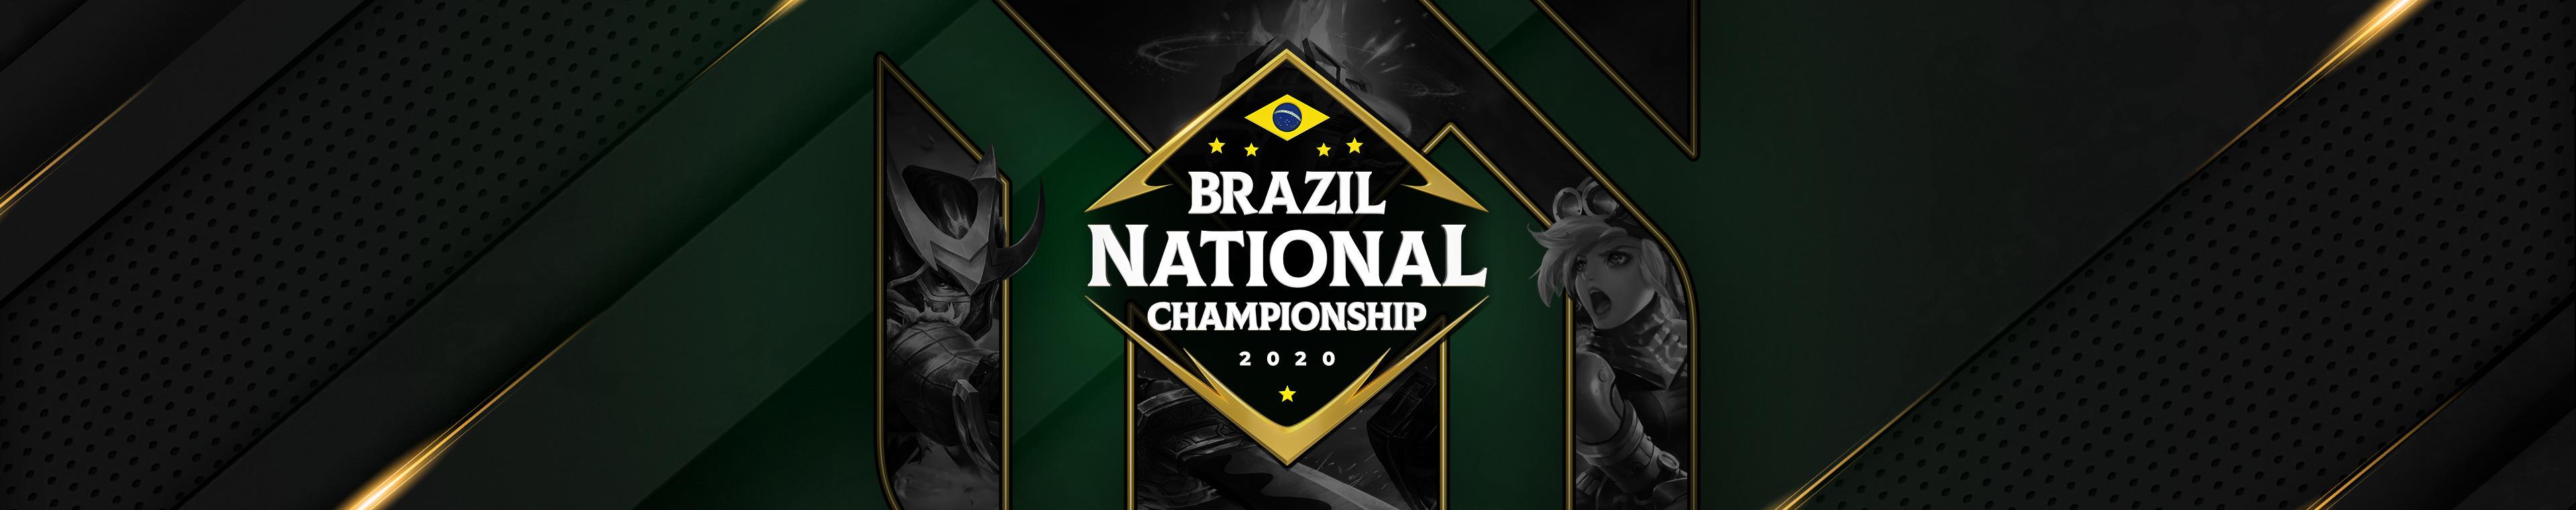 MLBB: Brazil National Championship 2020